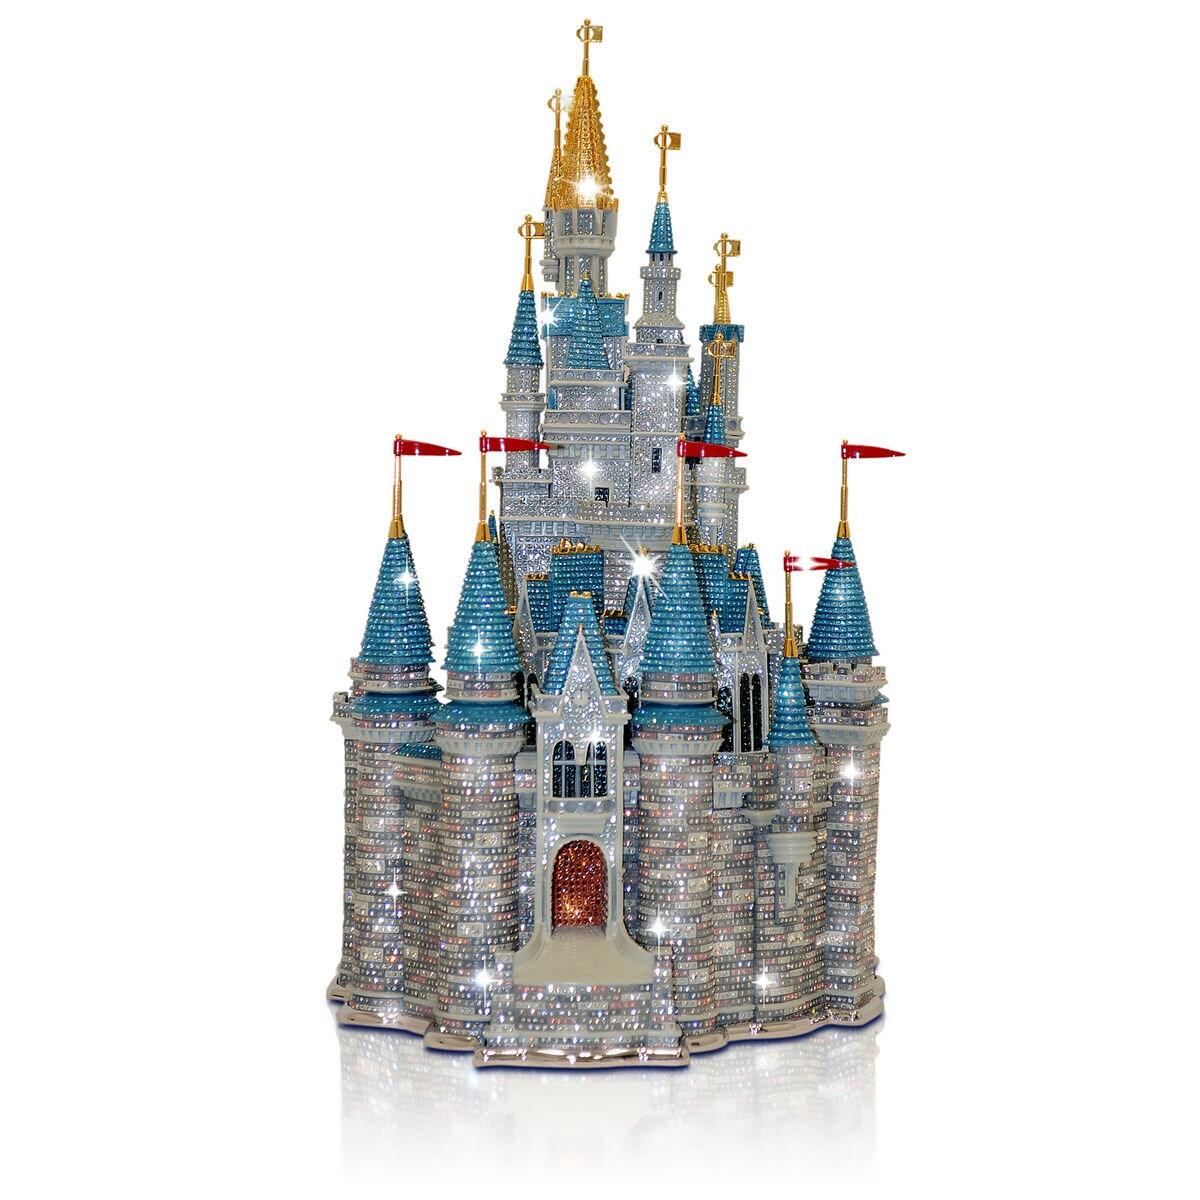 Walt Disney World Cinderella Castle Sculpture By Arribas Brothers